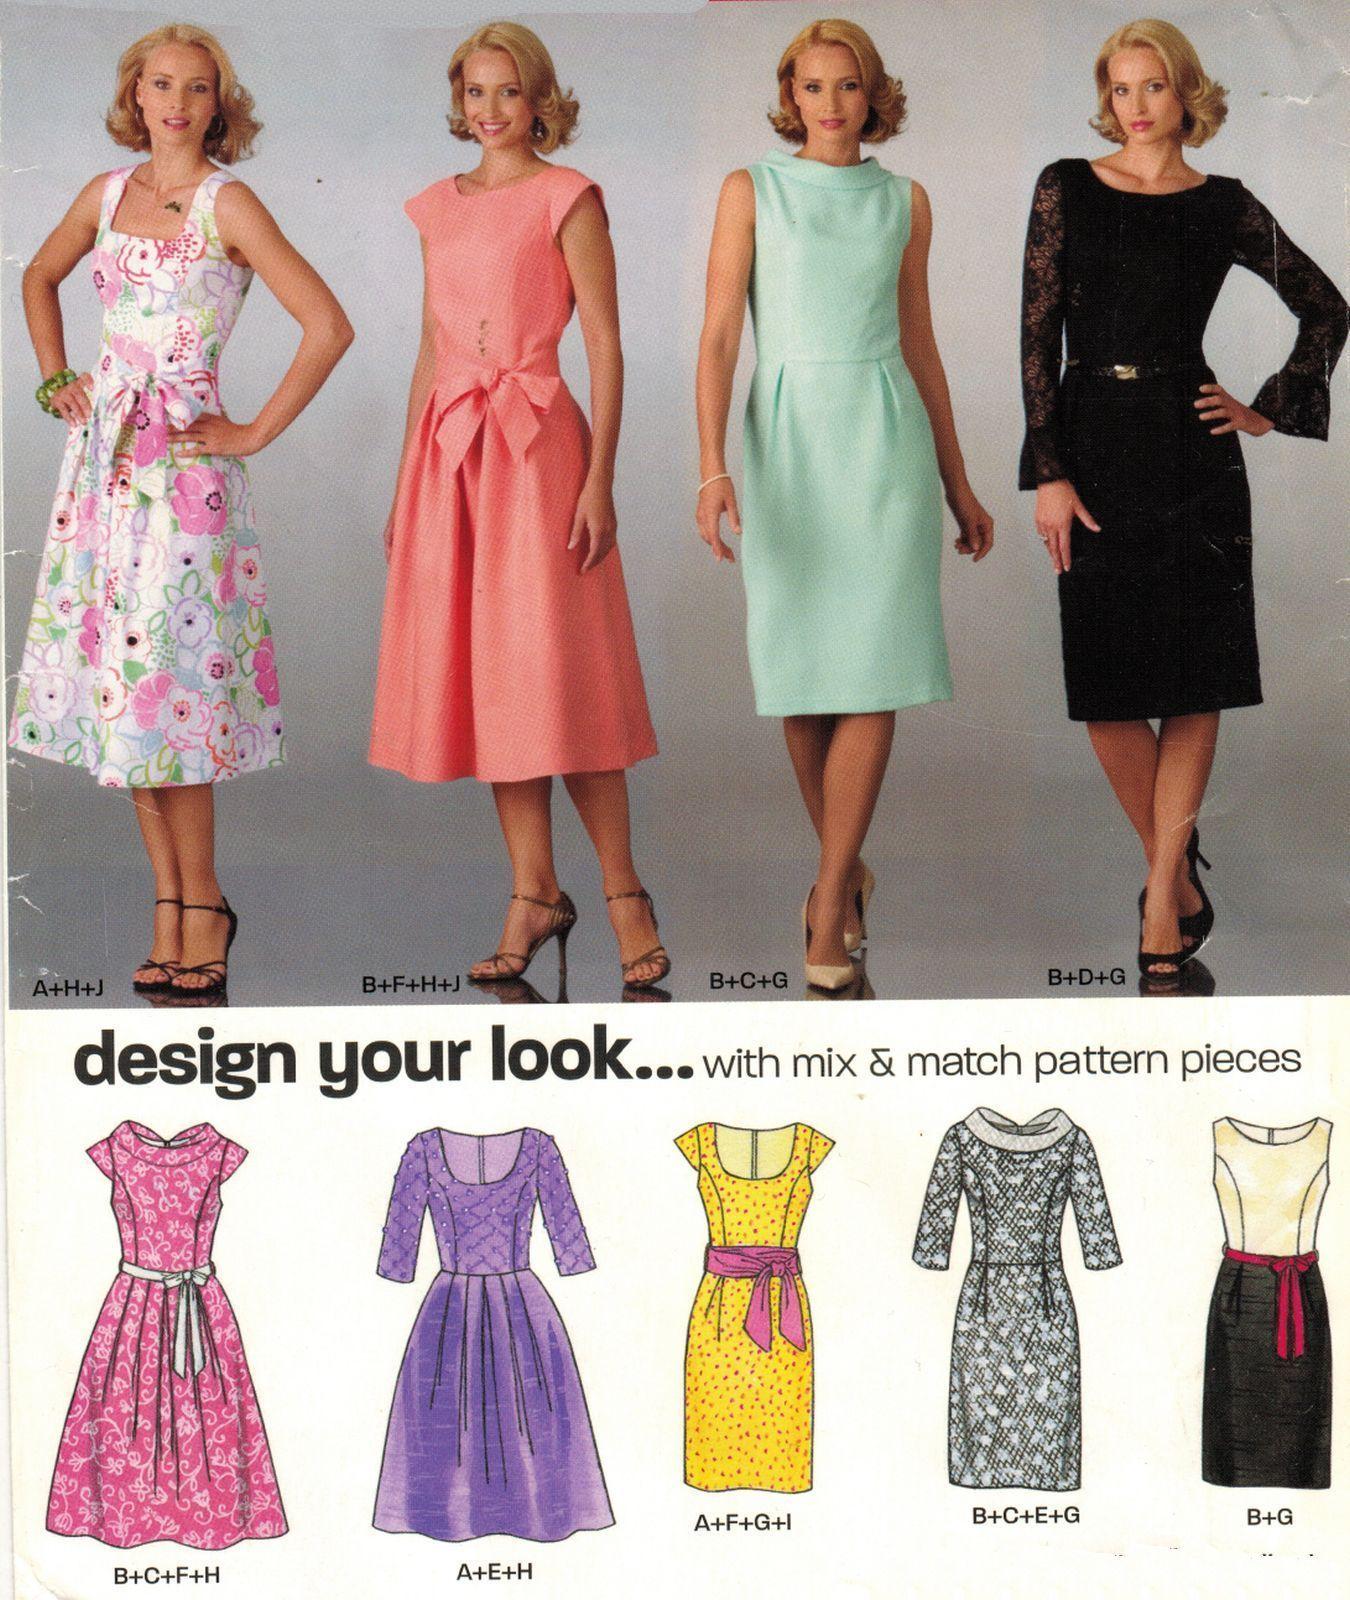 Misses Retro Mix Match Sleeve Neck Bodice Skirt Variation Dress Sew ...